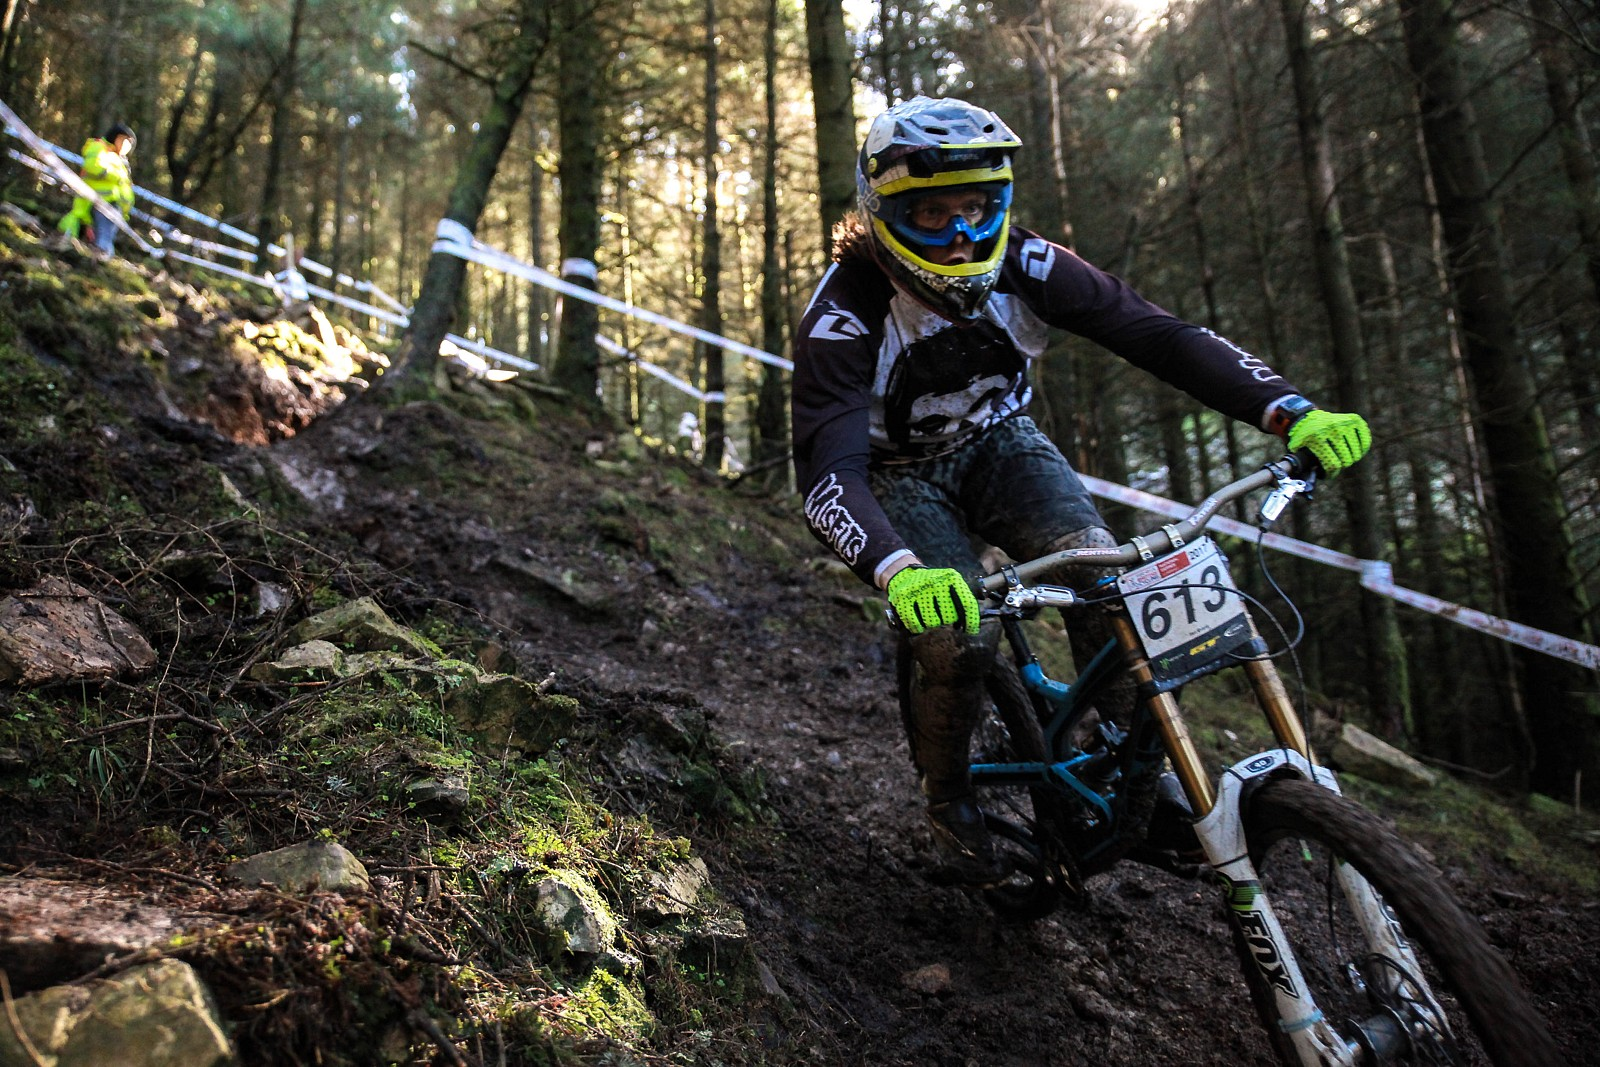 Nant G BDS - Mushrum - Mountain Biking Pictures - Vital MTB